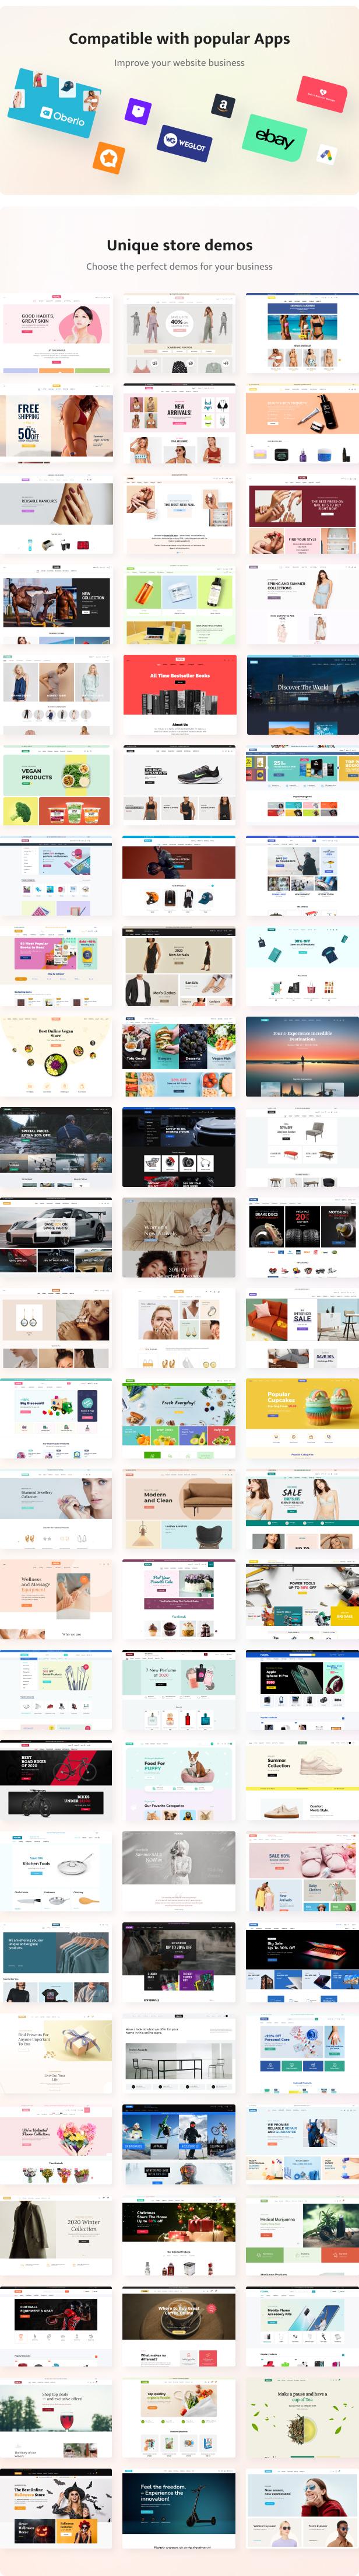 Roxxe - Responsive Multipurpose Shopify Theme - 13